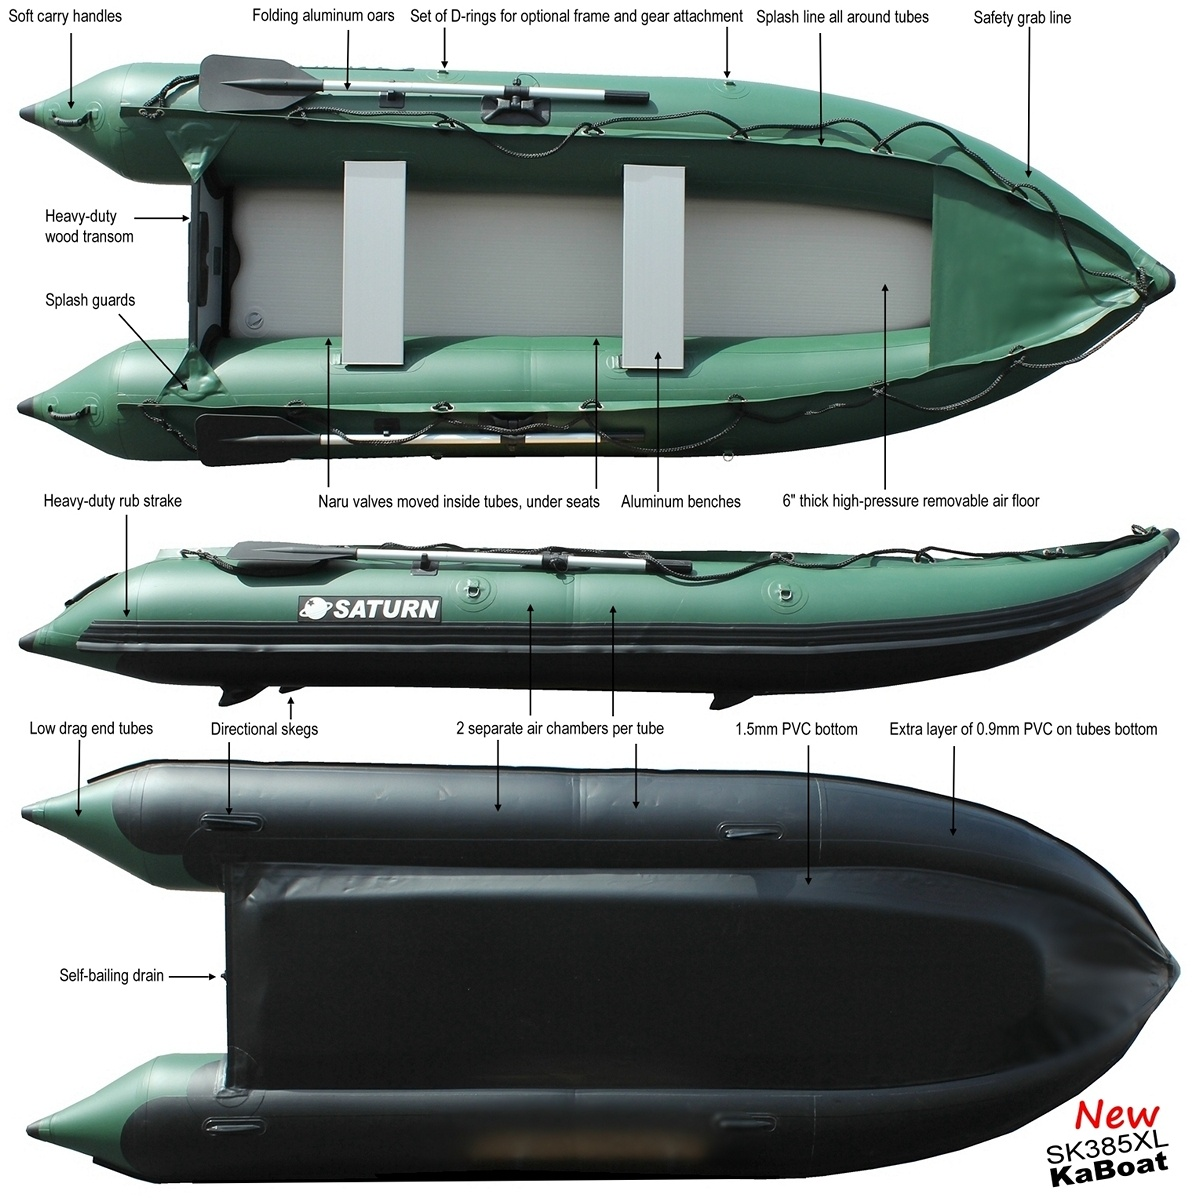 13' Saturn XL KaBoat. 13' XL KaBoat (Alaska)